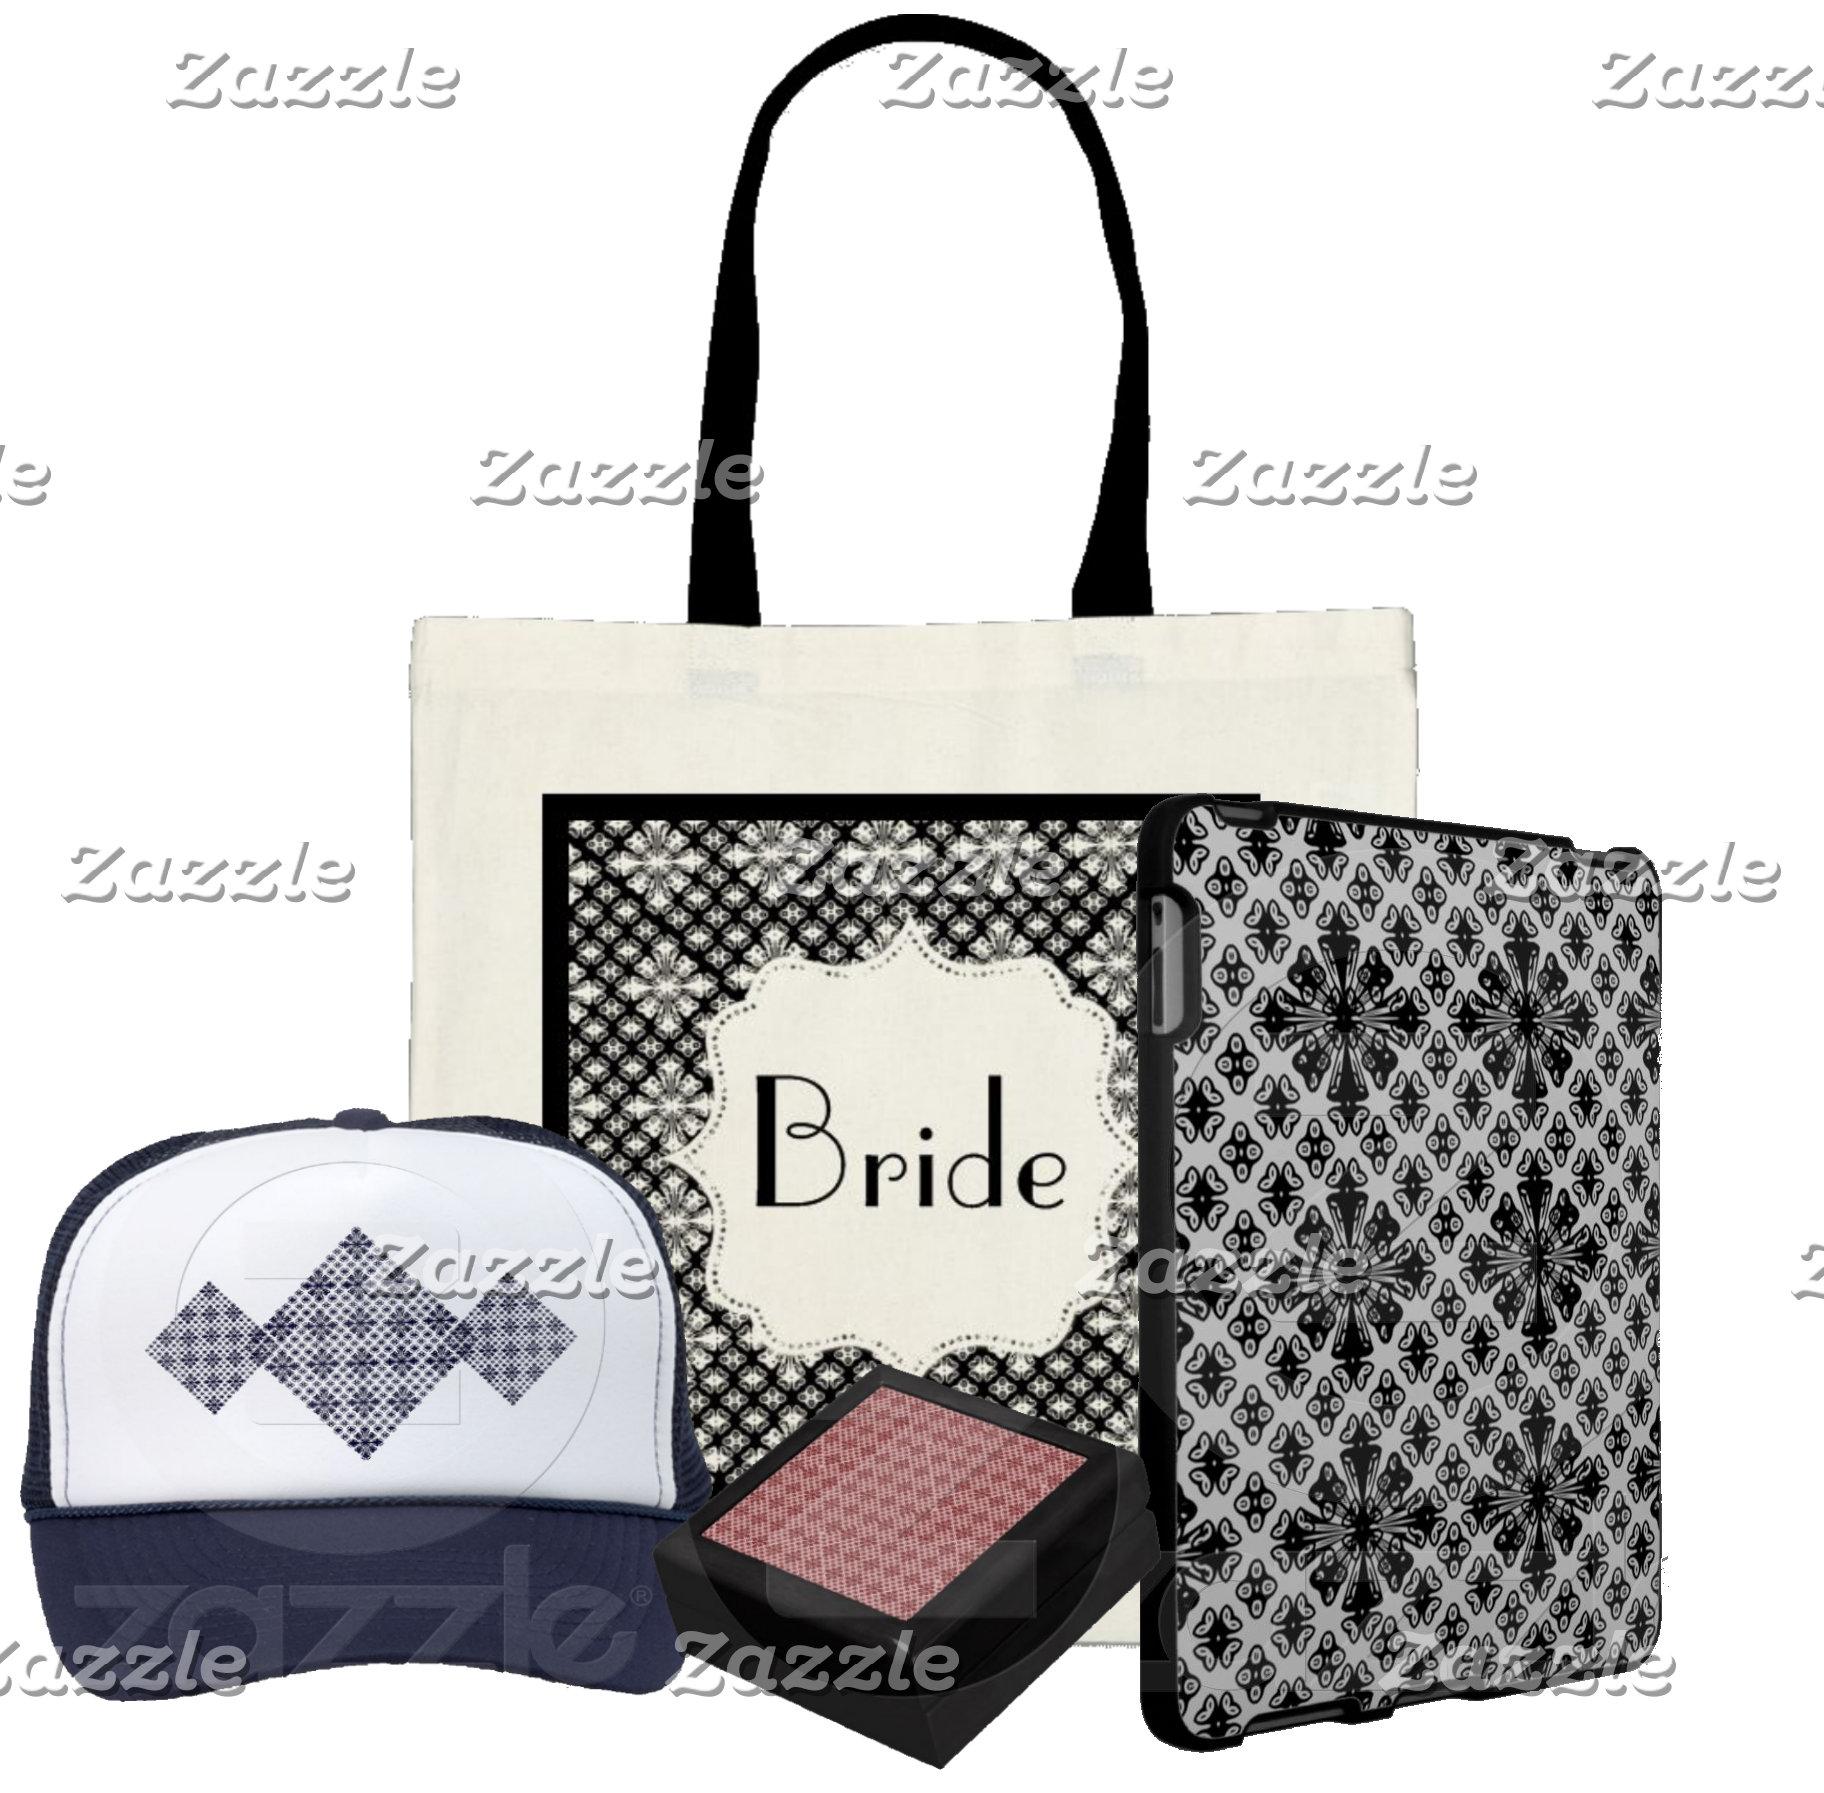 Damask & More On Wedding Favors & More: 5 designs!